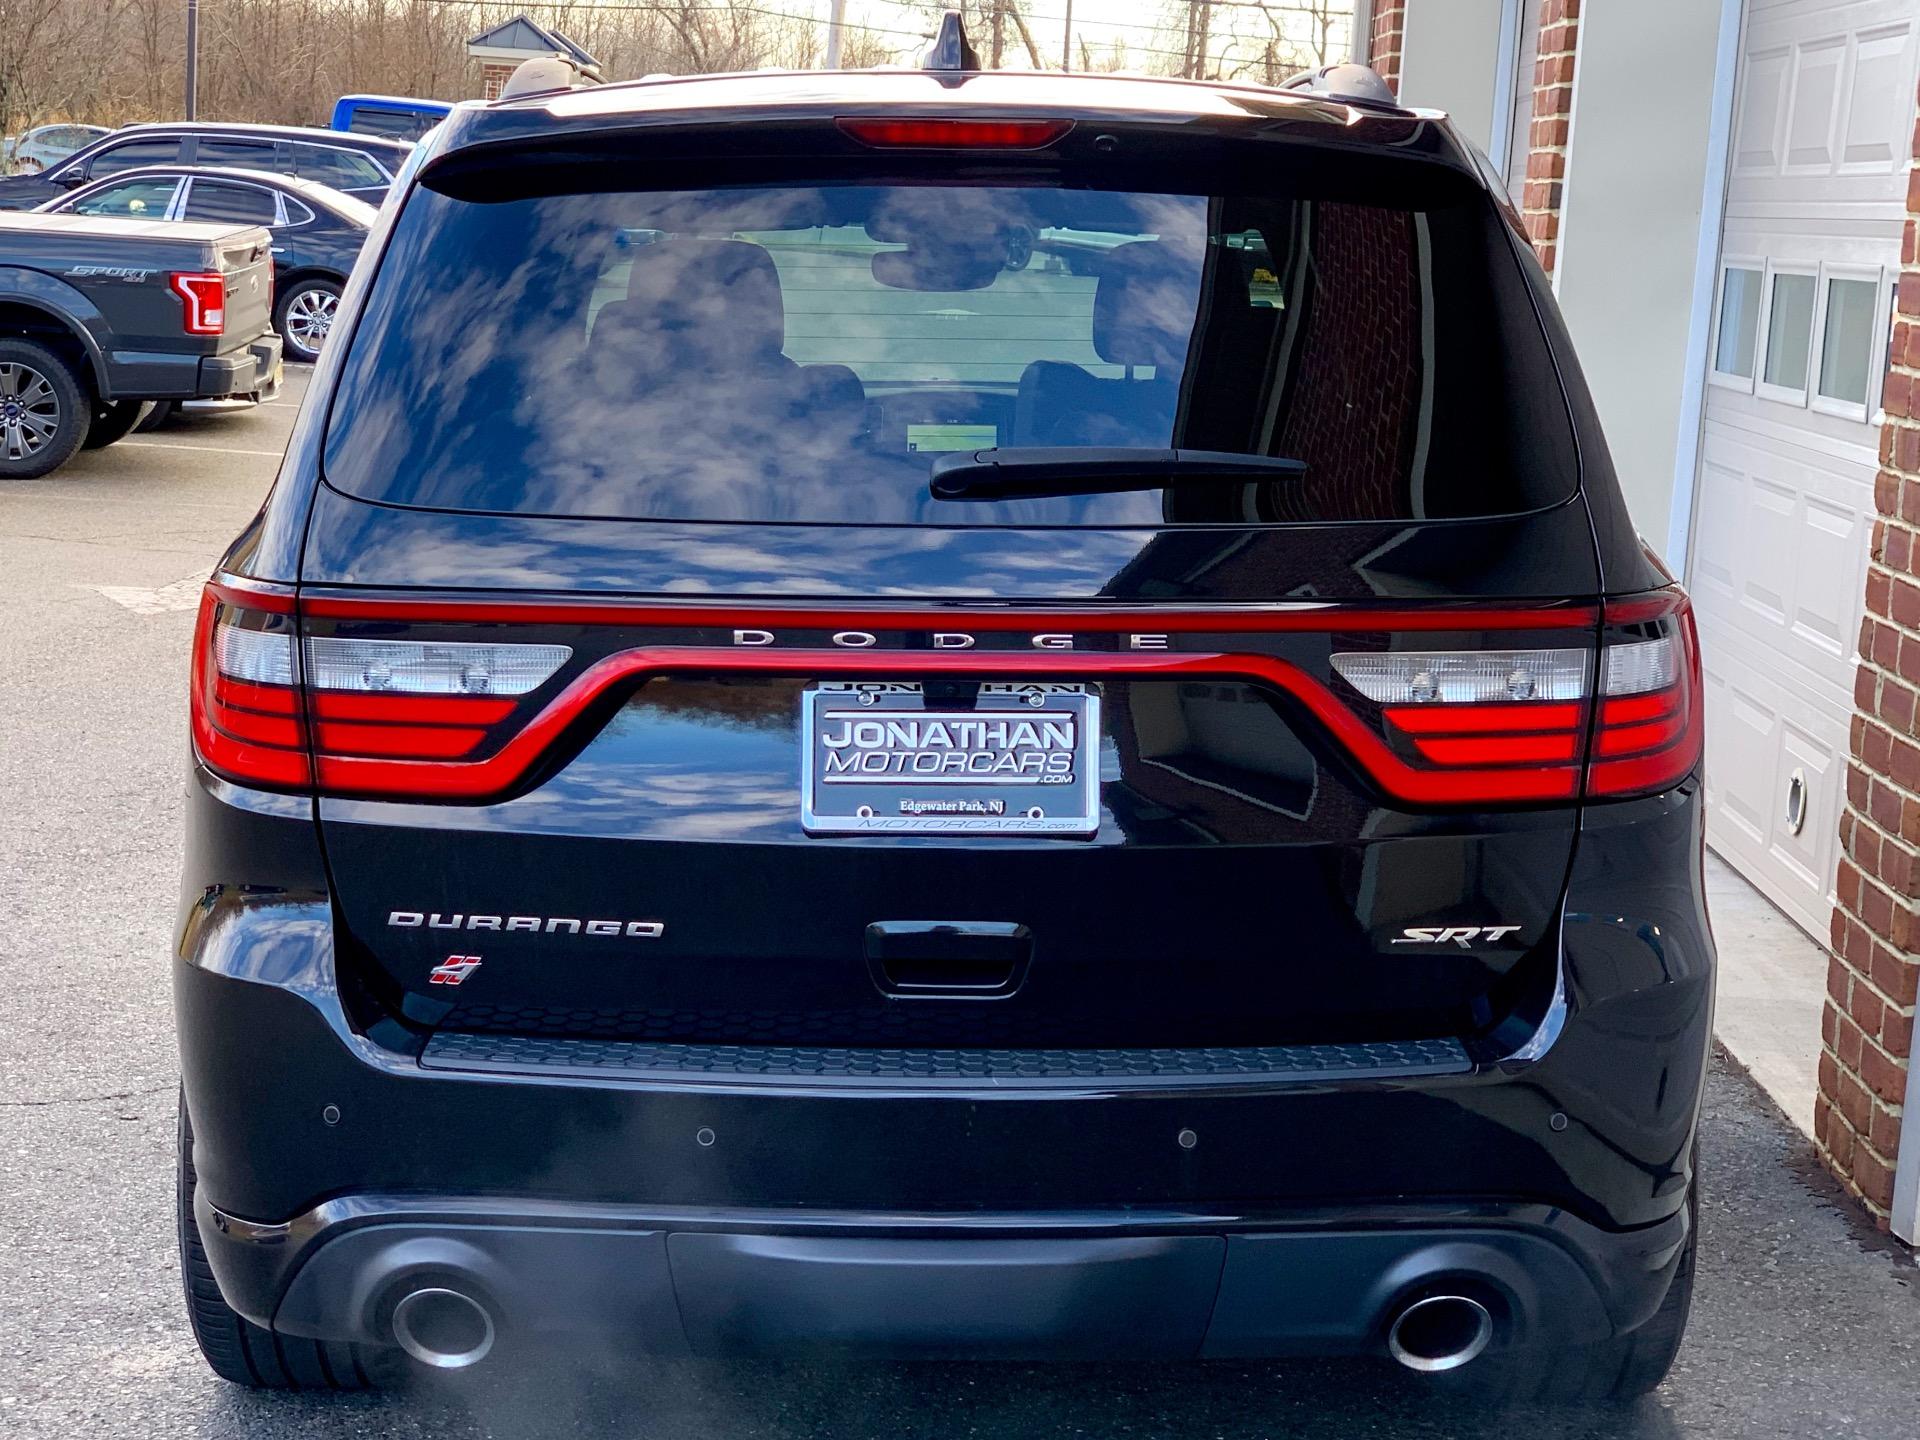 Used-2018-Dodge-Durango-SRT